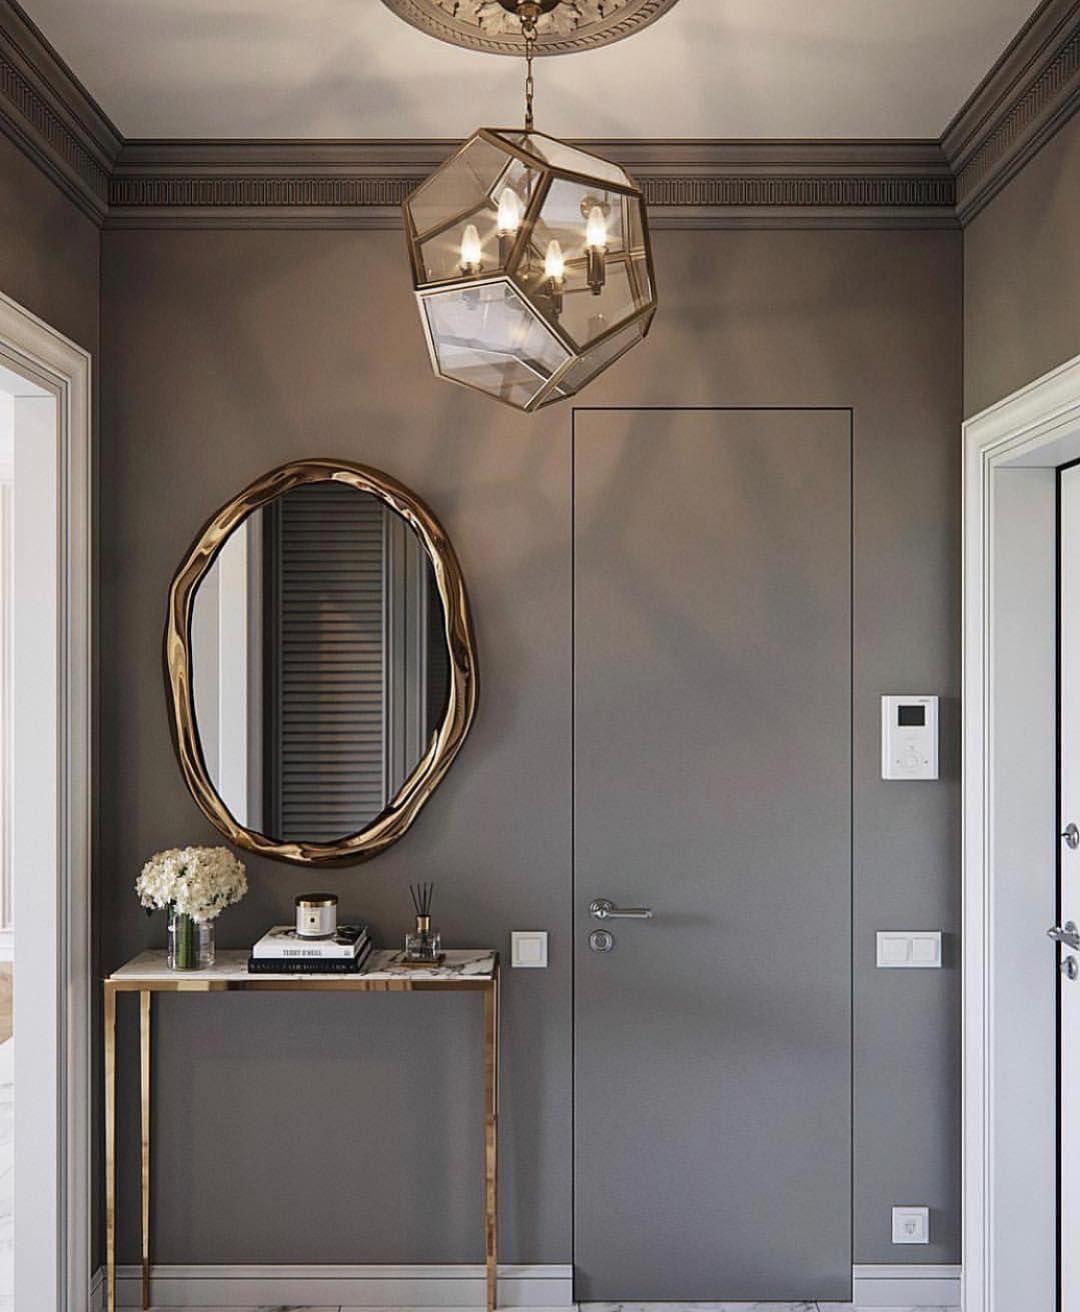 New The 10 Best Home Decor With Pictures تصميم ديكور الجزيره جوتن حدائق واجهات منزل دهان ابواب مدا Interior Round Mirror Bathroom Living Decor